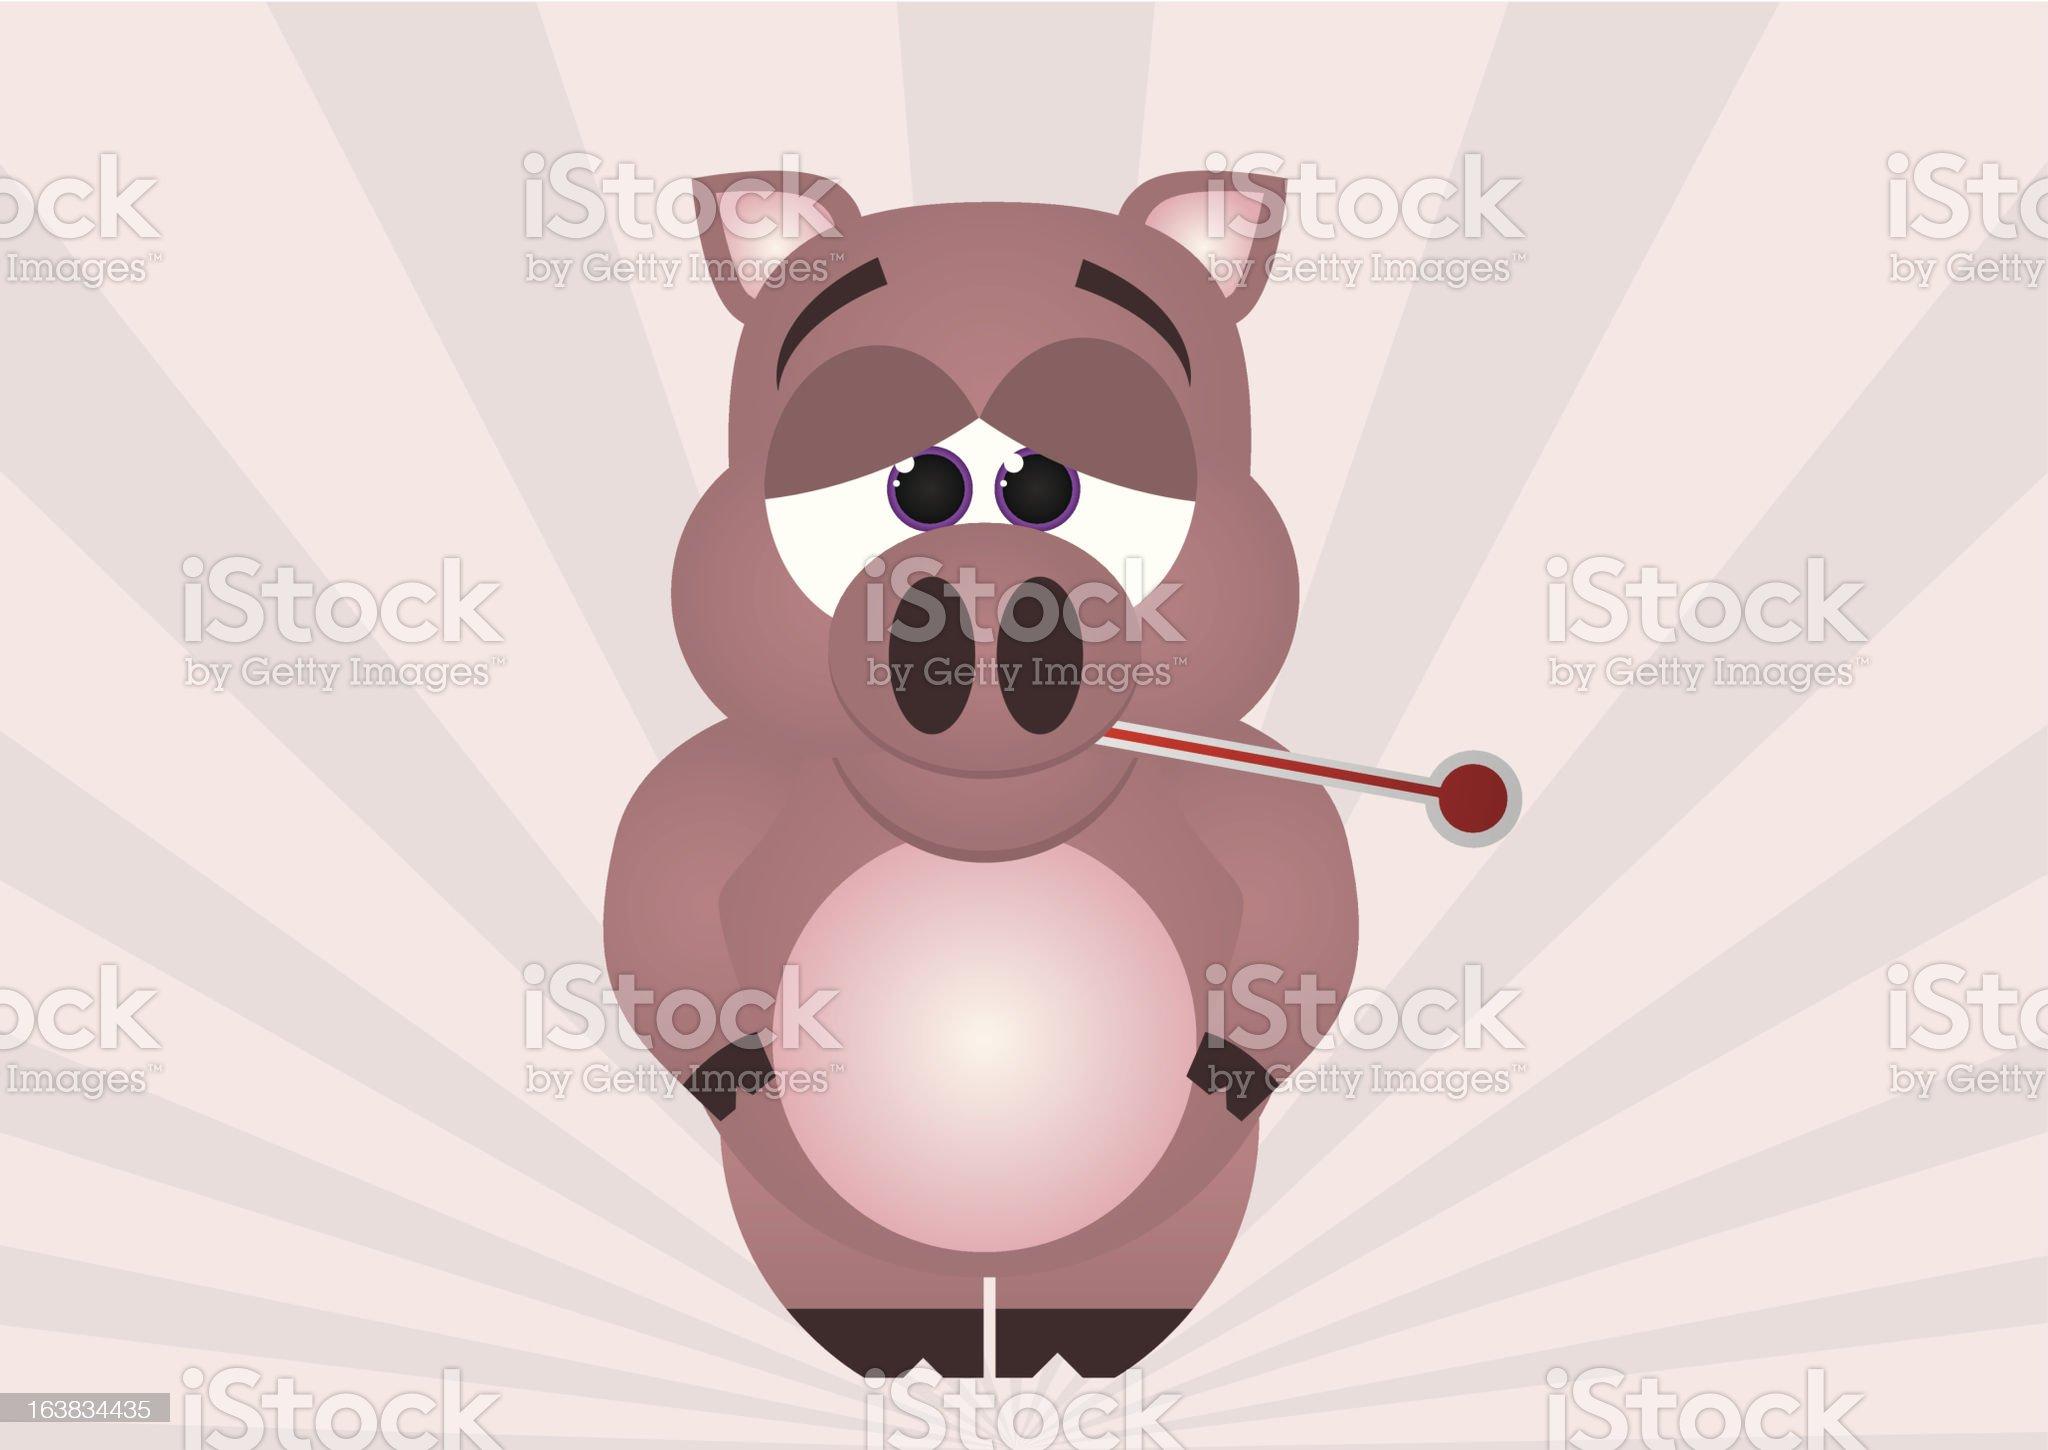 Swine Flu royalty-free stock vector art